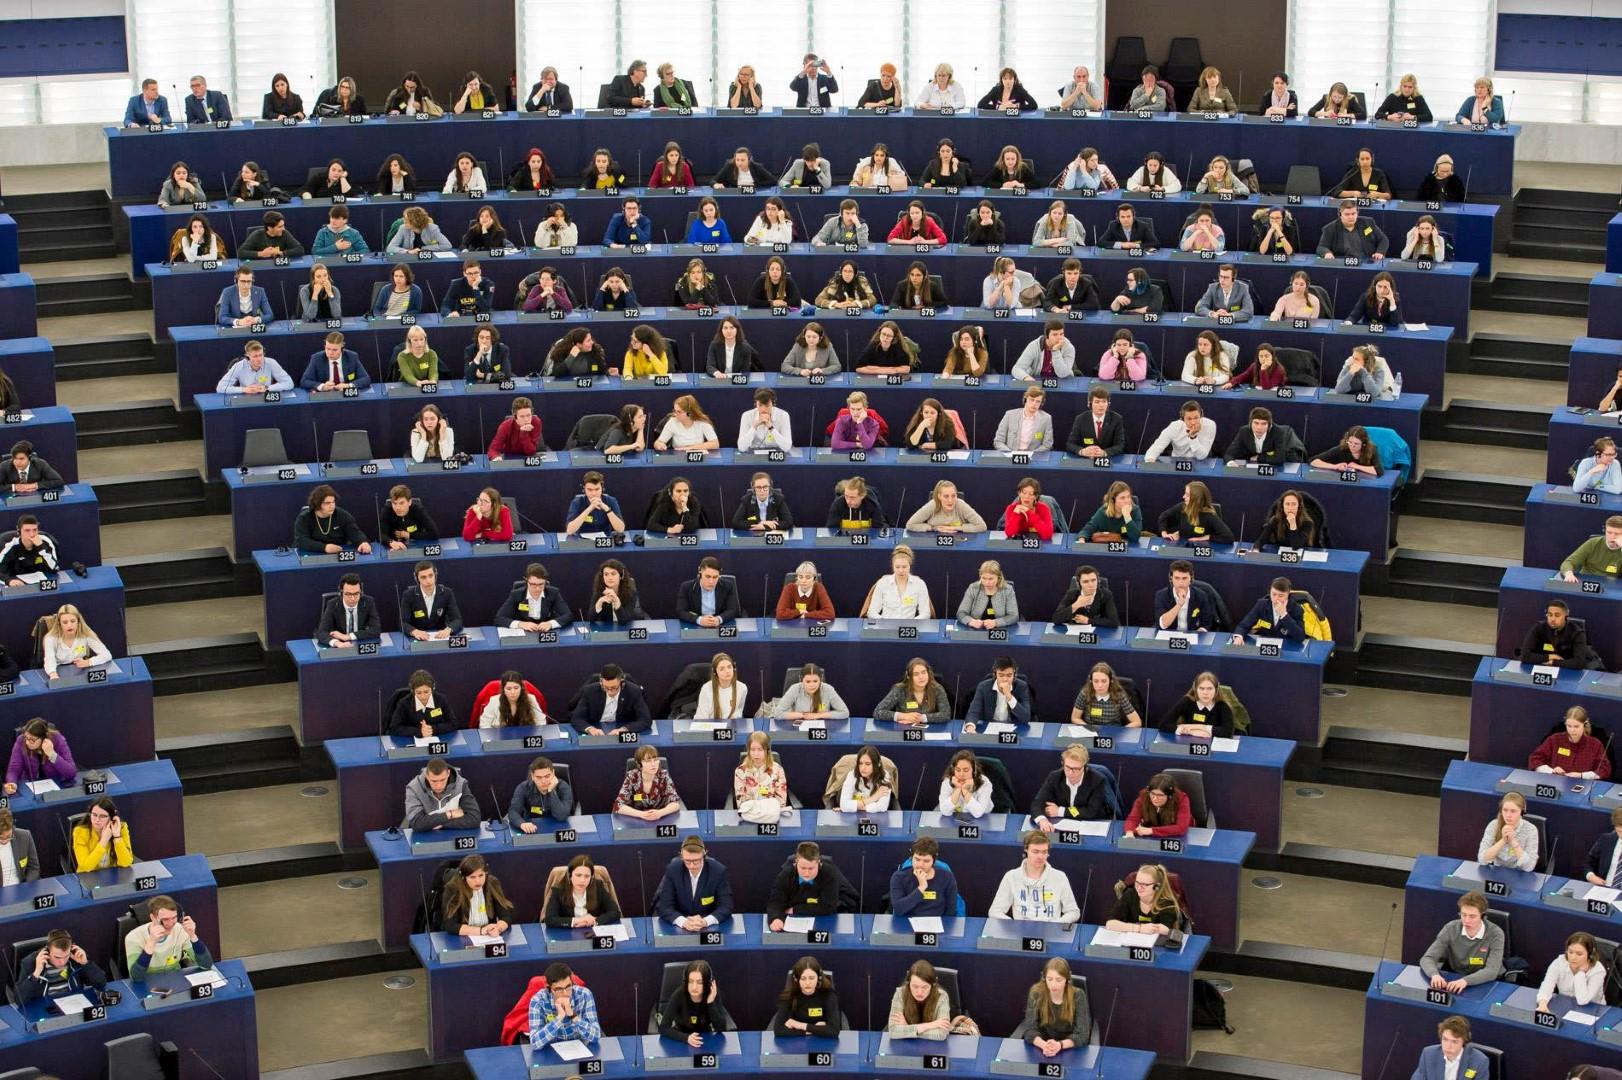 Gimnazistai Europos parlamente (4)